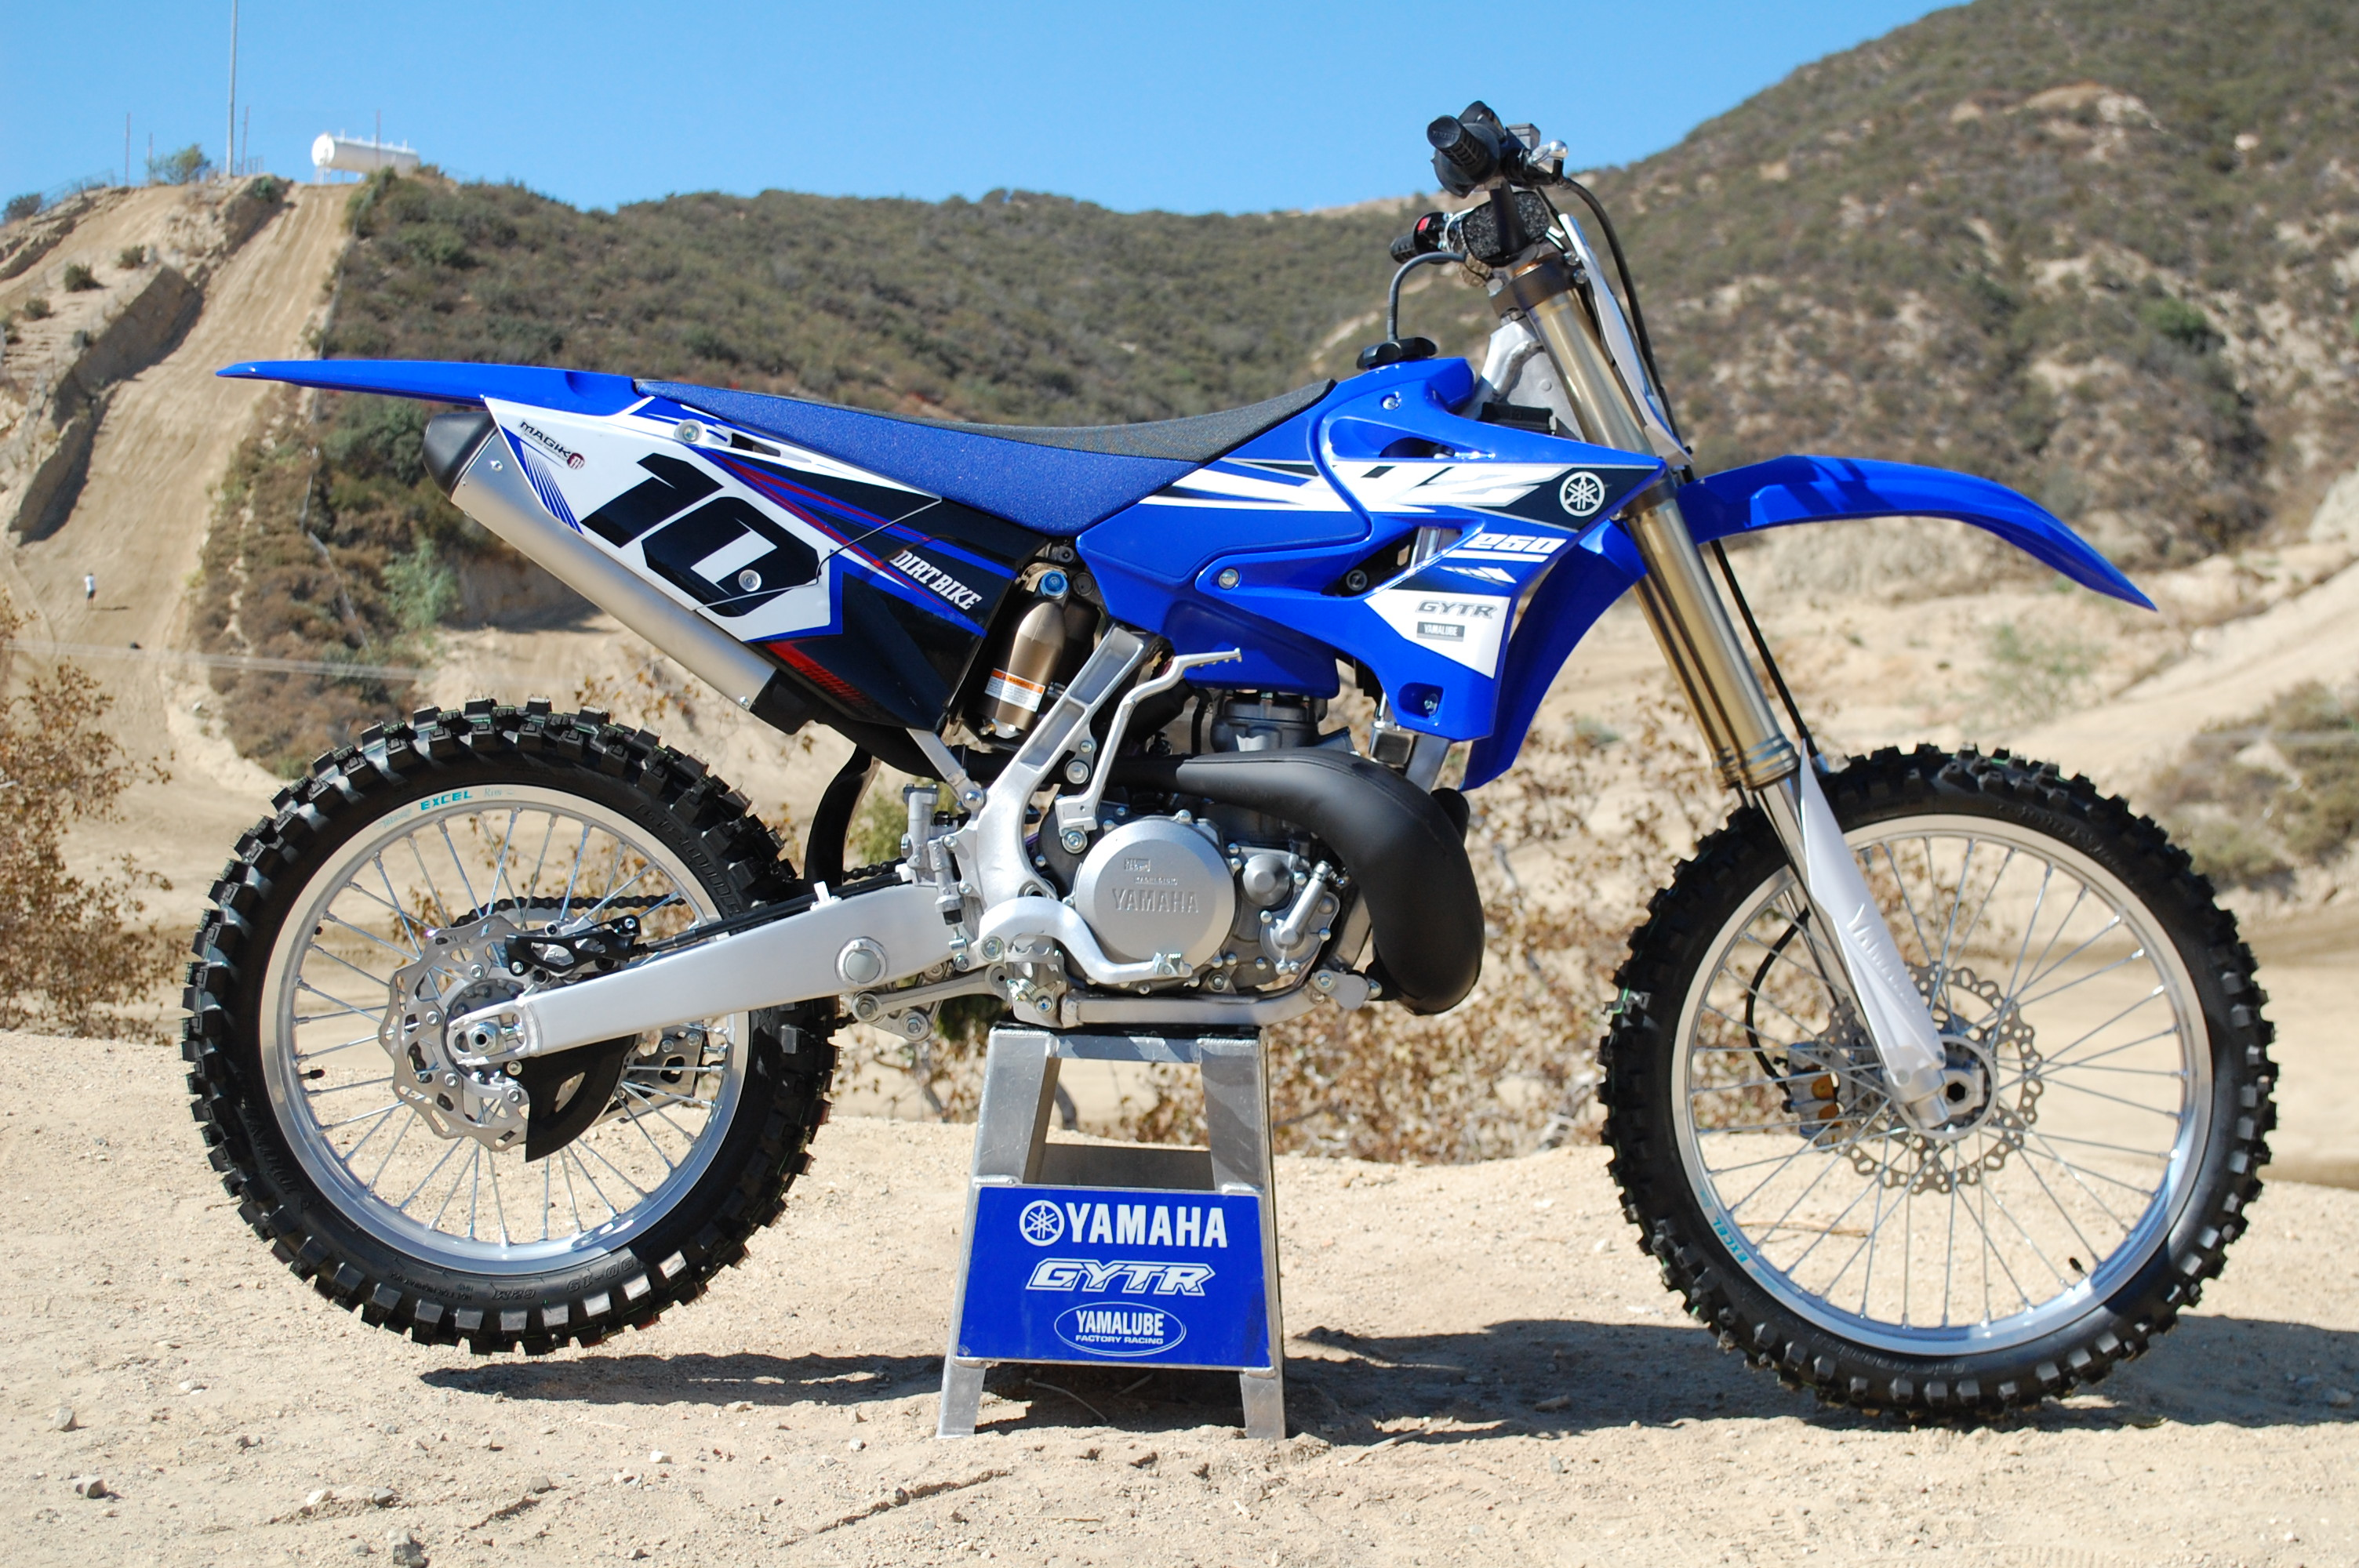 2015 Yamaha Yz250 Premix Dirt Bike Magazine